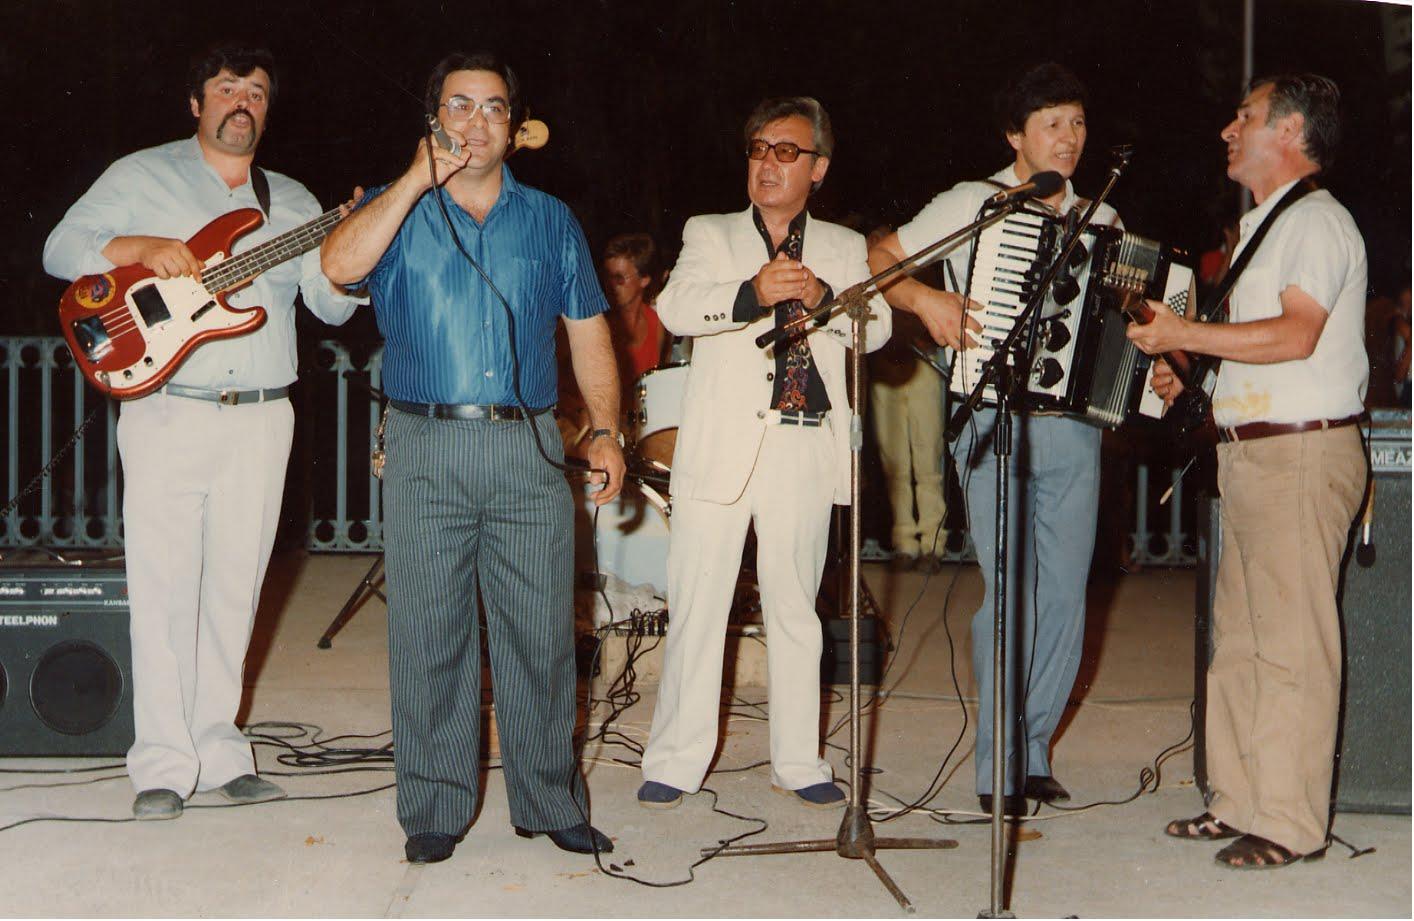 La musica pop a san Marco in Lamis